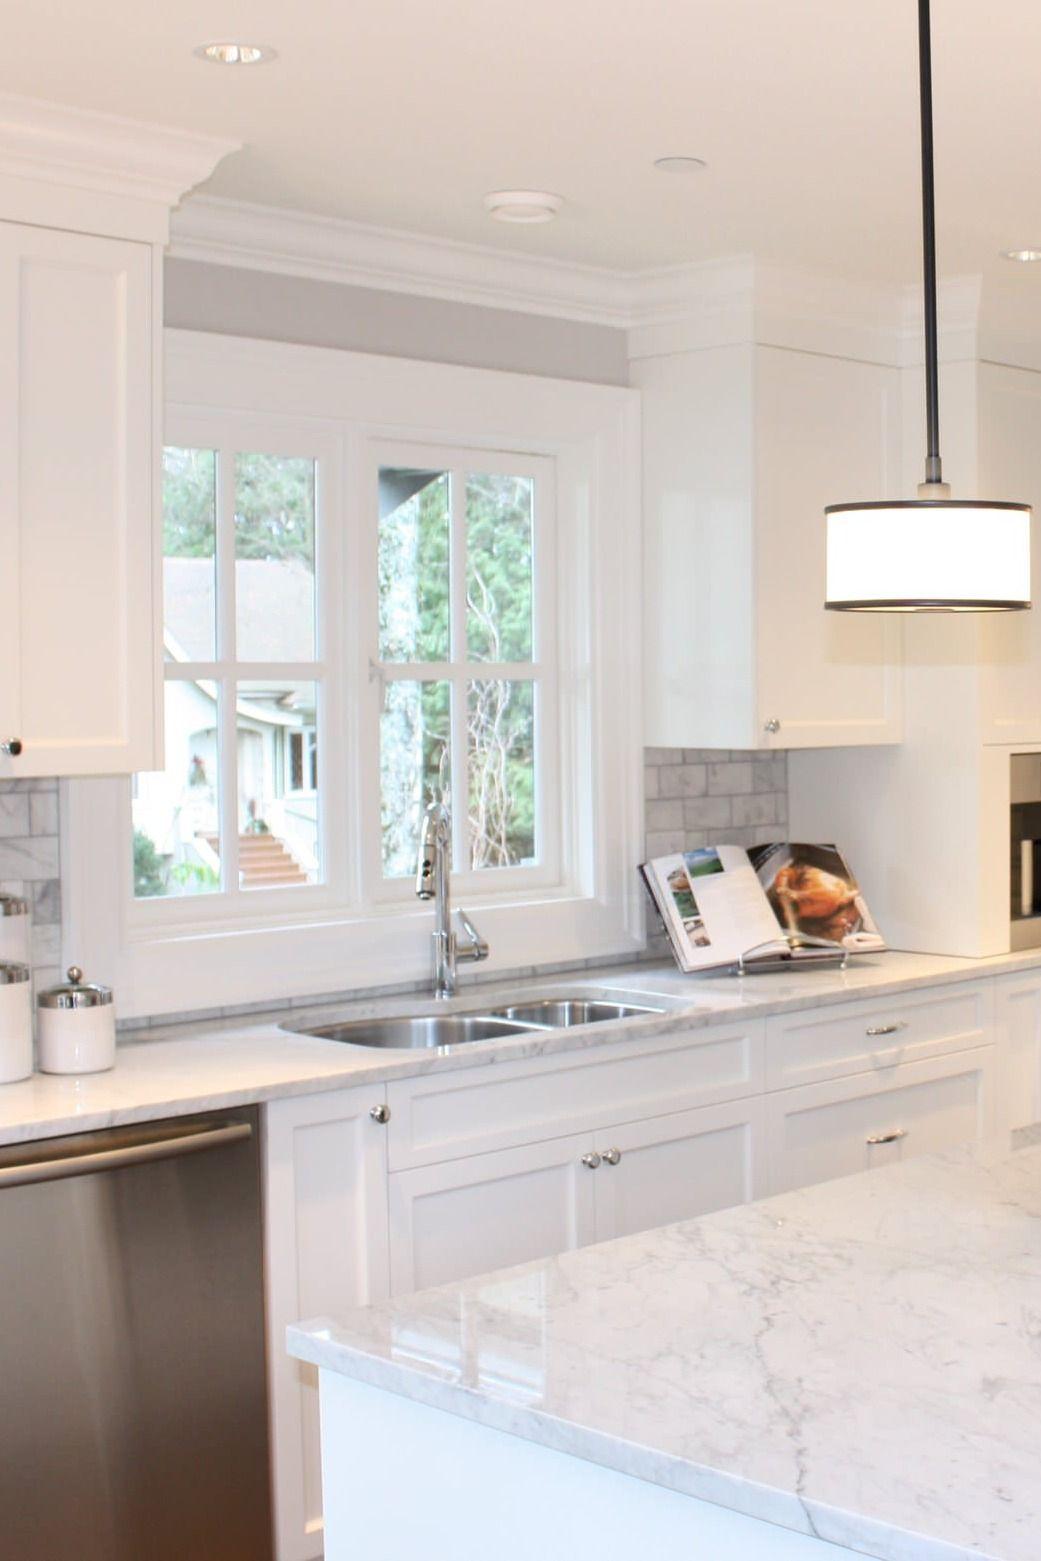 All White Kitchen Marble Countertops Cabinets Marble Backsplash Dark Hardwood In 2020 Kitchen Design Countertops White Marble Kitchen White Marble Kitchen Countertops